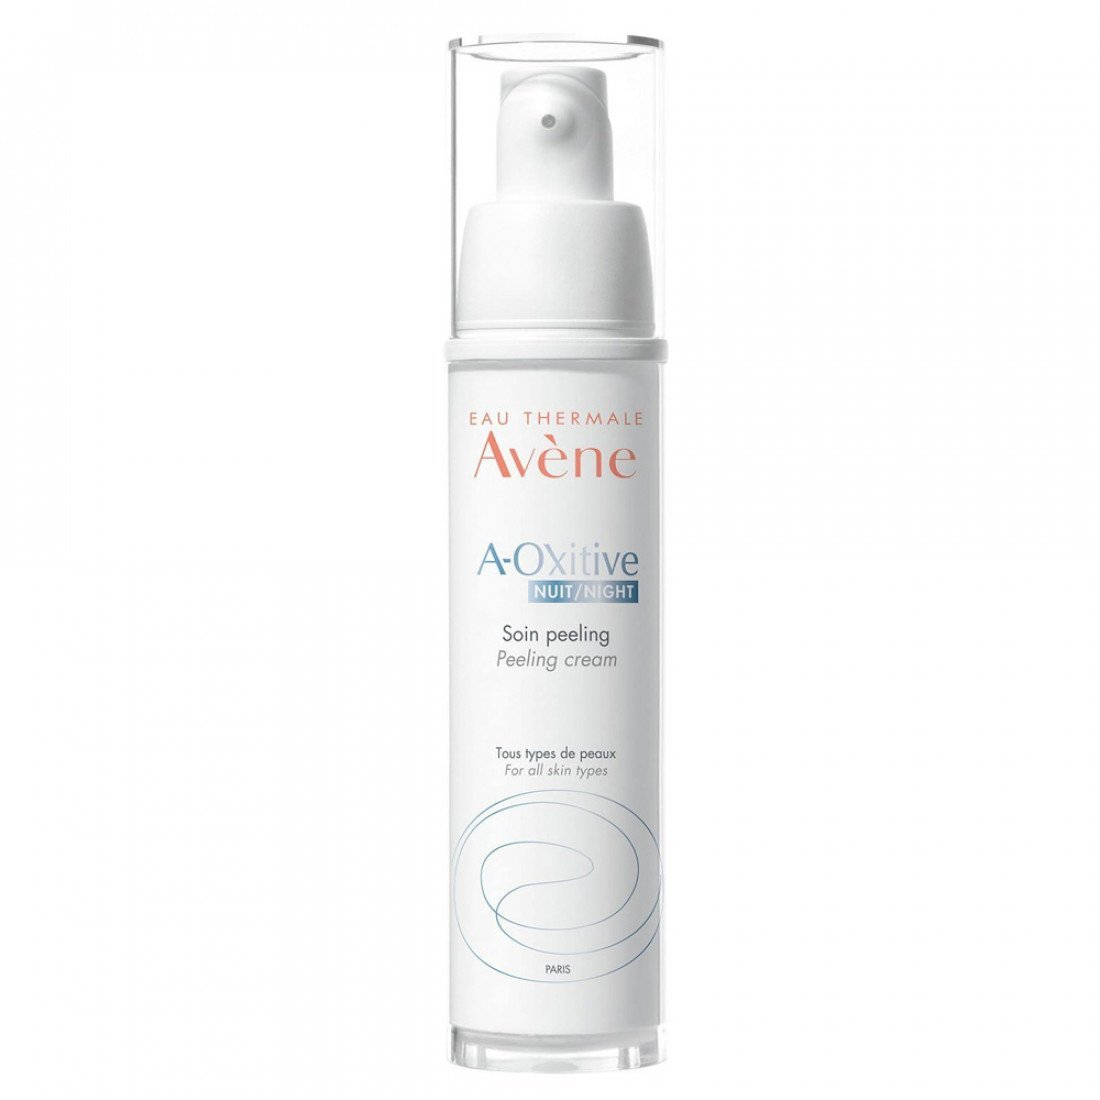 Avene A-Oxitive Peeling Night Cream Φροντίδα Νύχτας με Δράση Peeling για Λάμψη & Πρώτες Ρυτίδες 30ml